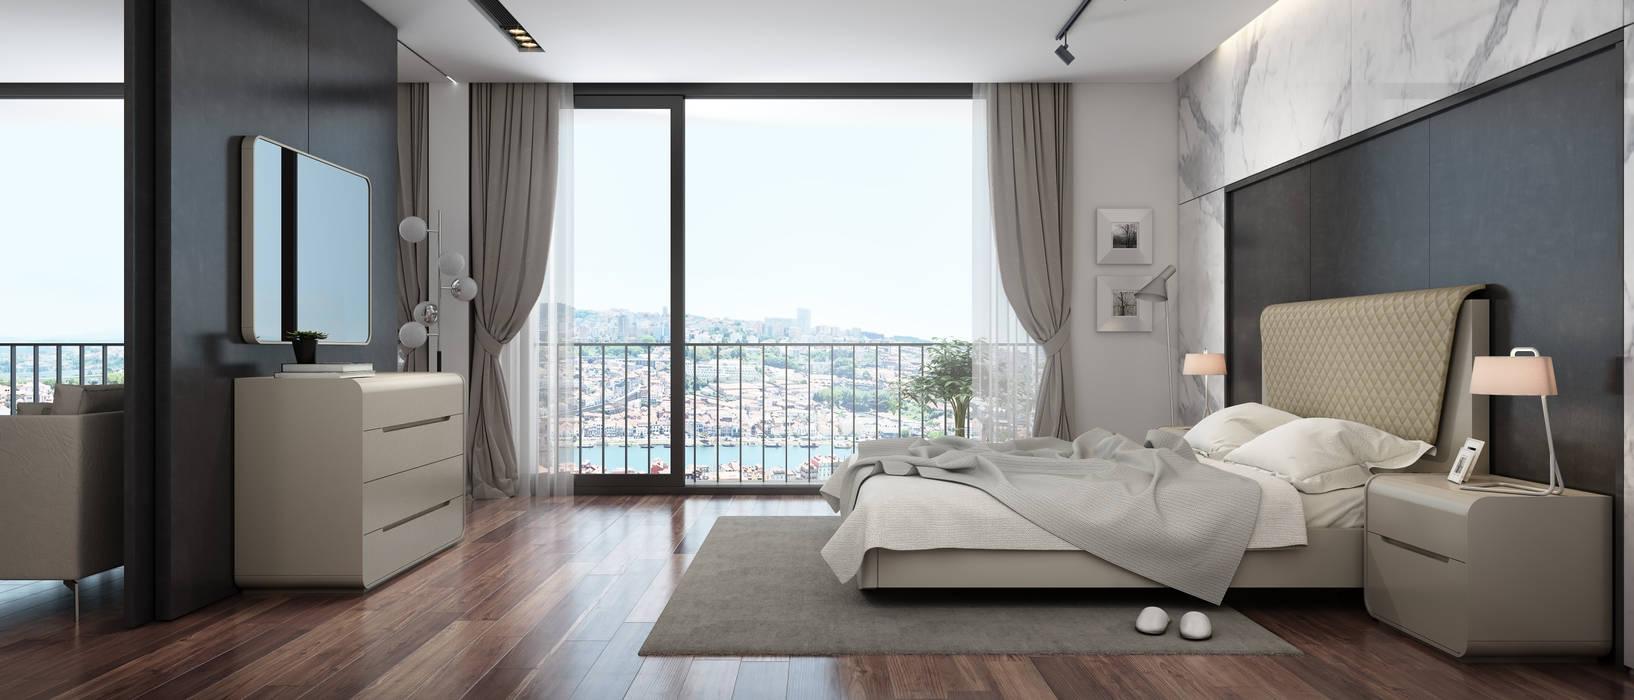 Farimovel Furniture BedroomBeds & headboards